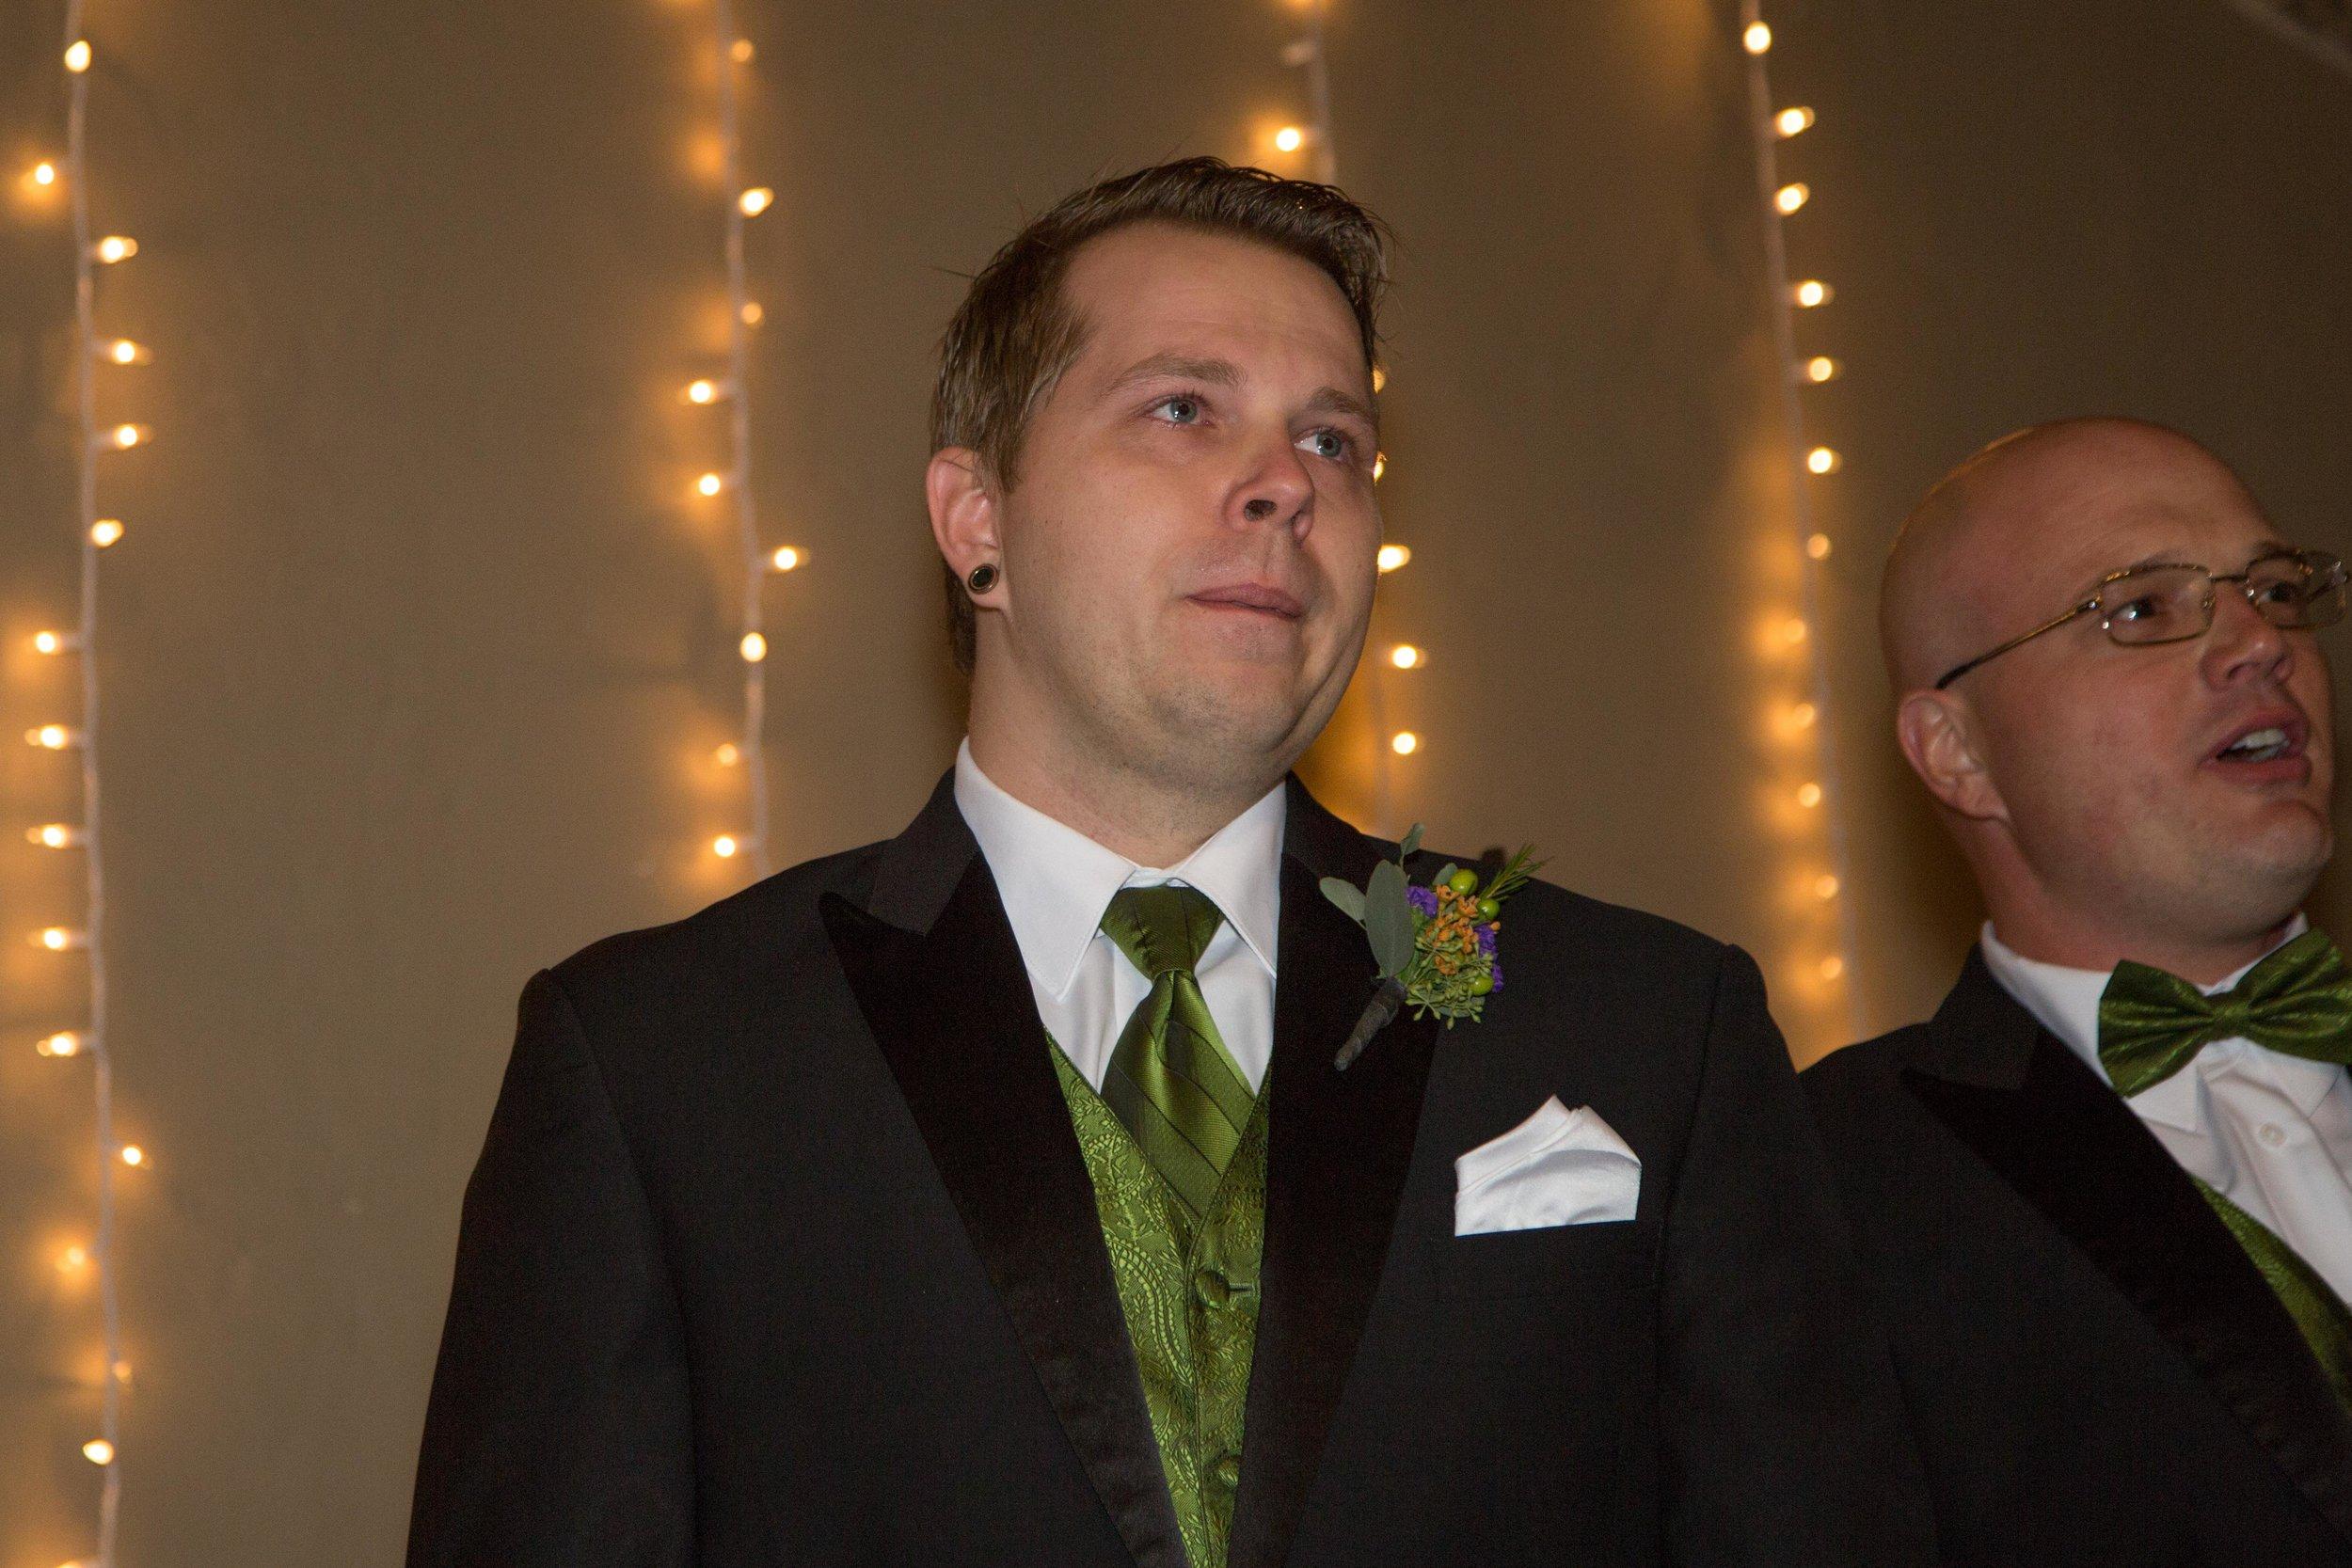 00001_Parker-Wedding-Sp-51.jpg